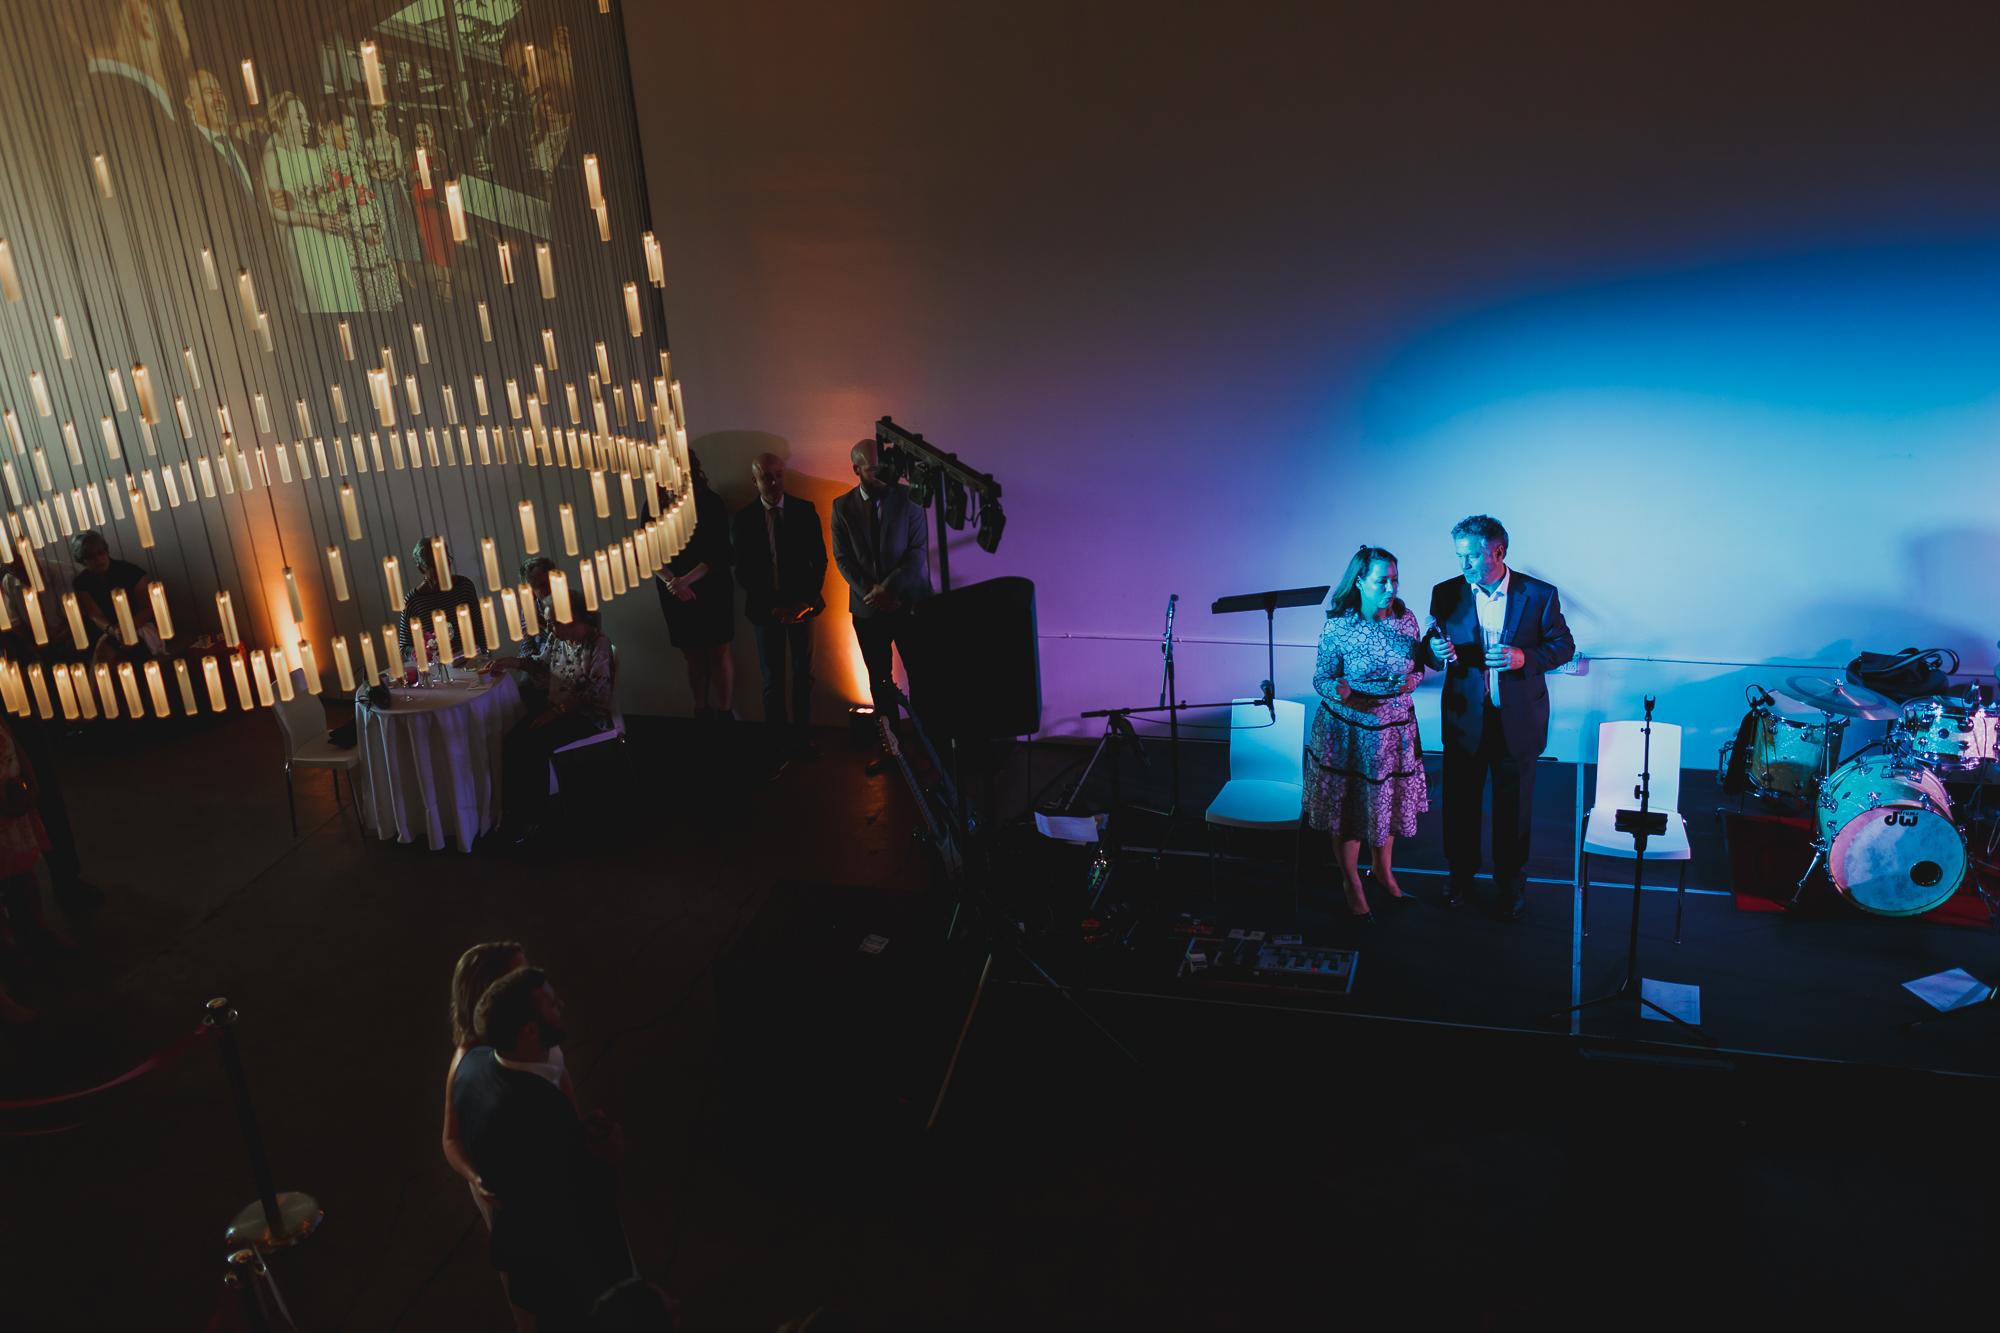 canvas event space wedding photos by Krista Welch-0080.jpg